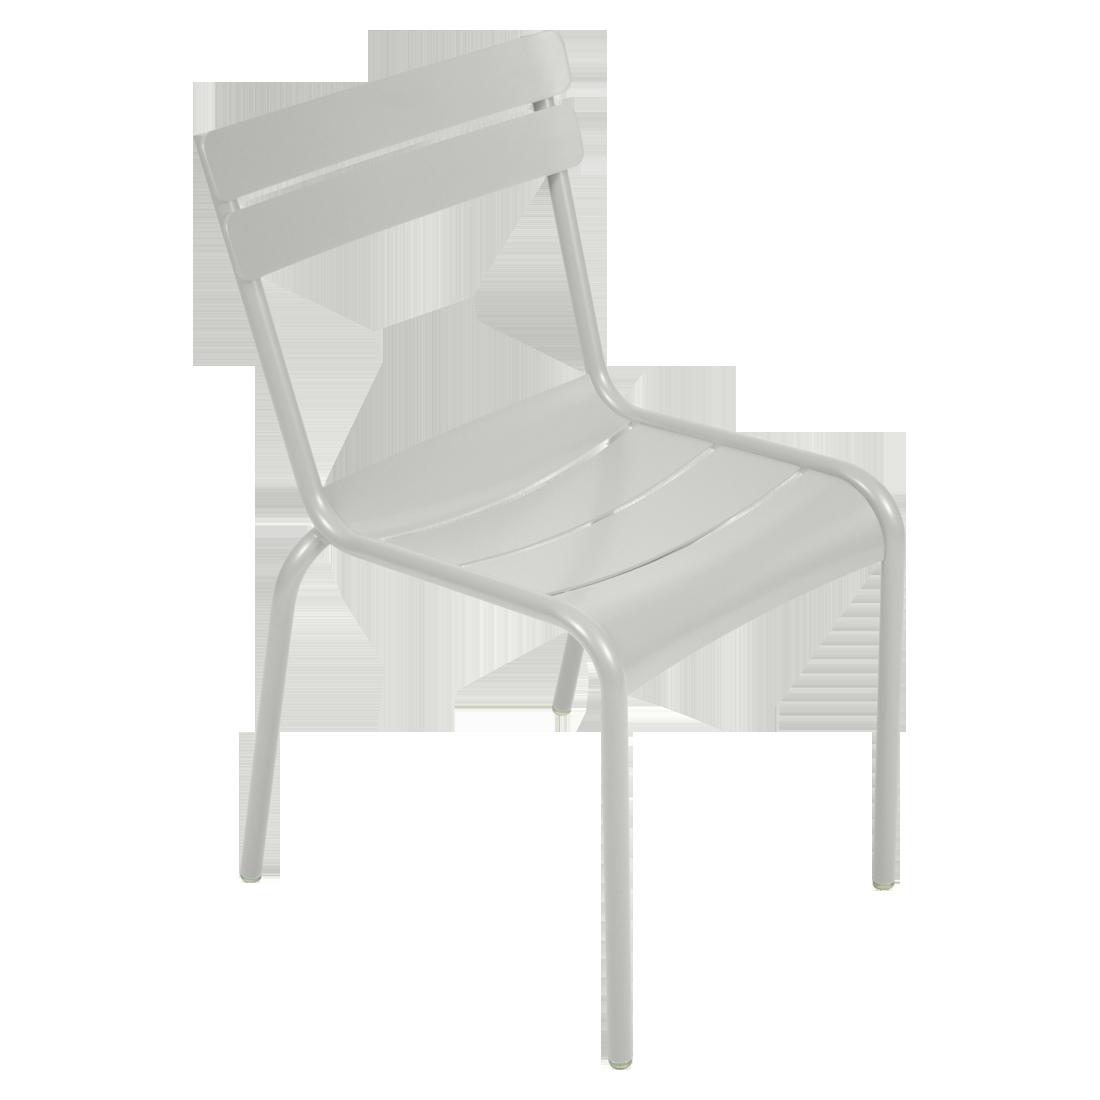 chaise luxembourg de fermob gris m tal. Black Bedroom Furniture Sets. Home Design Ideas